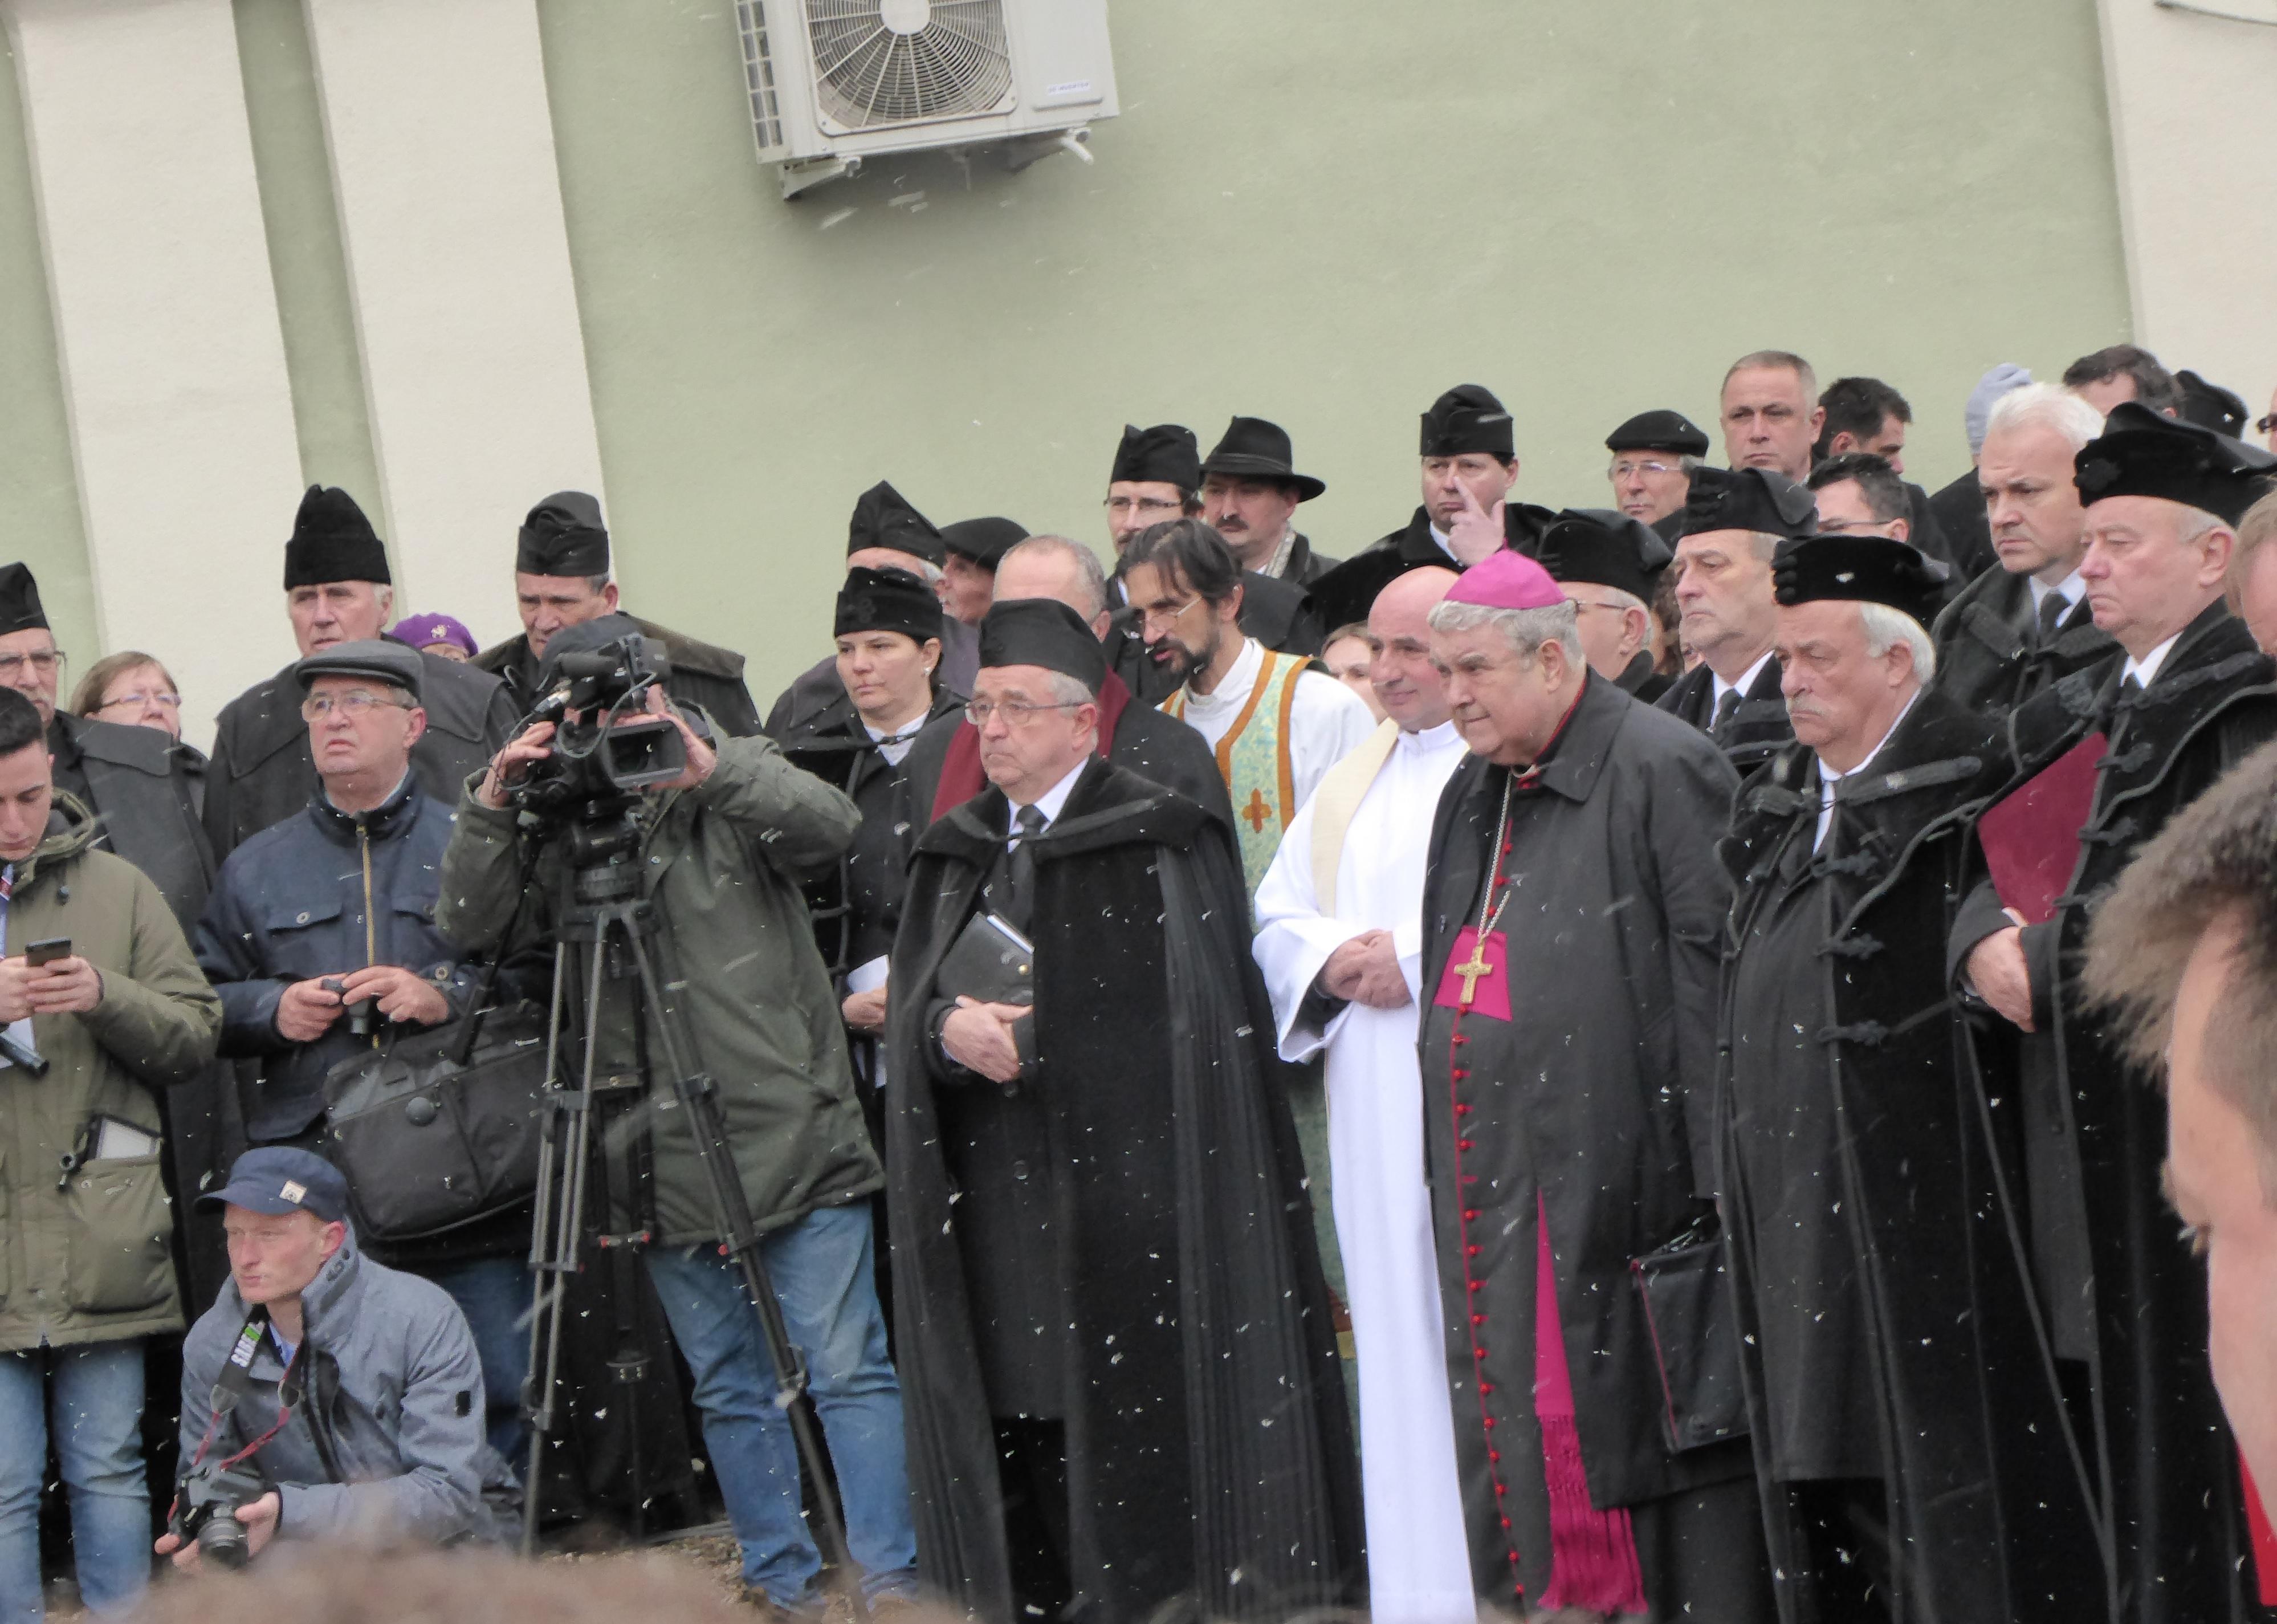 Bishop Ferenc Balint Benczedi of the HUC and Archbishop Gyorgy Jakubinyi